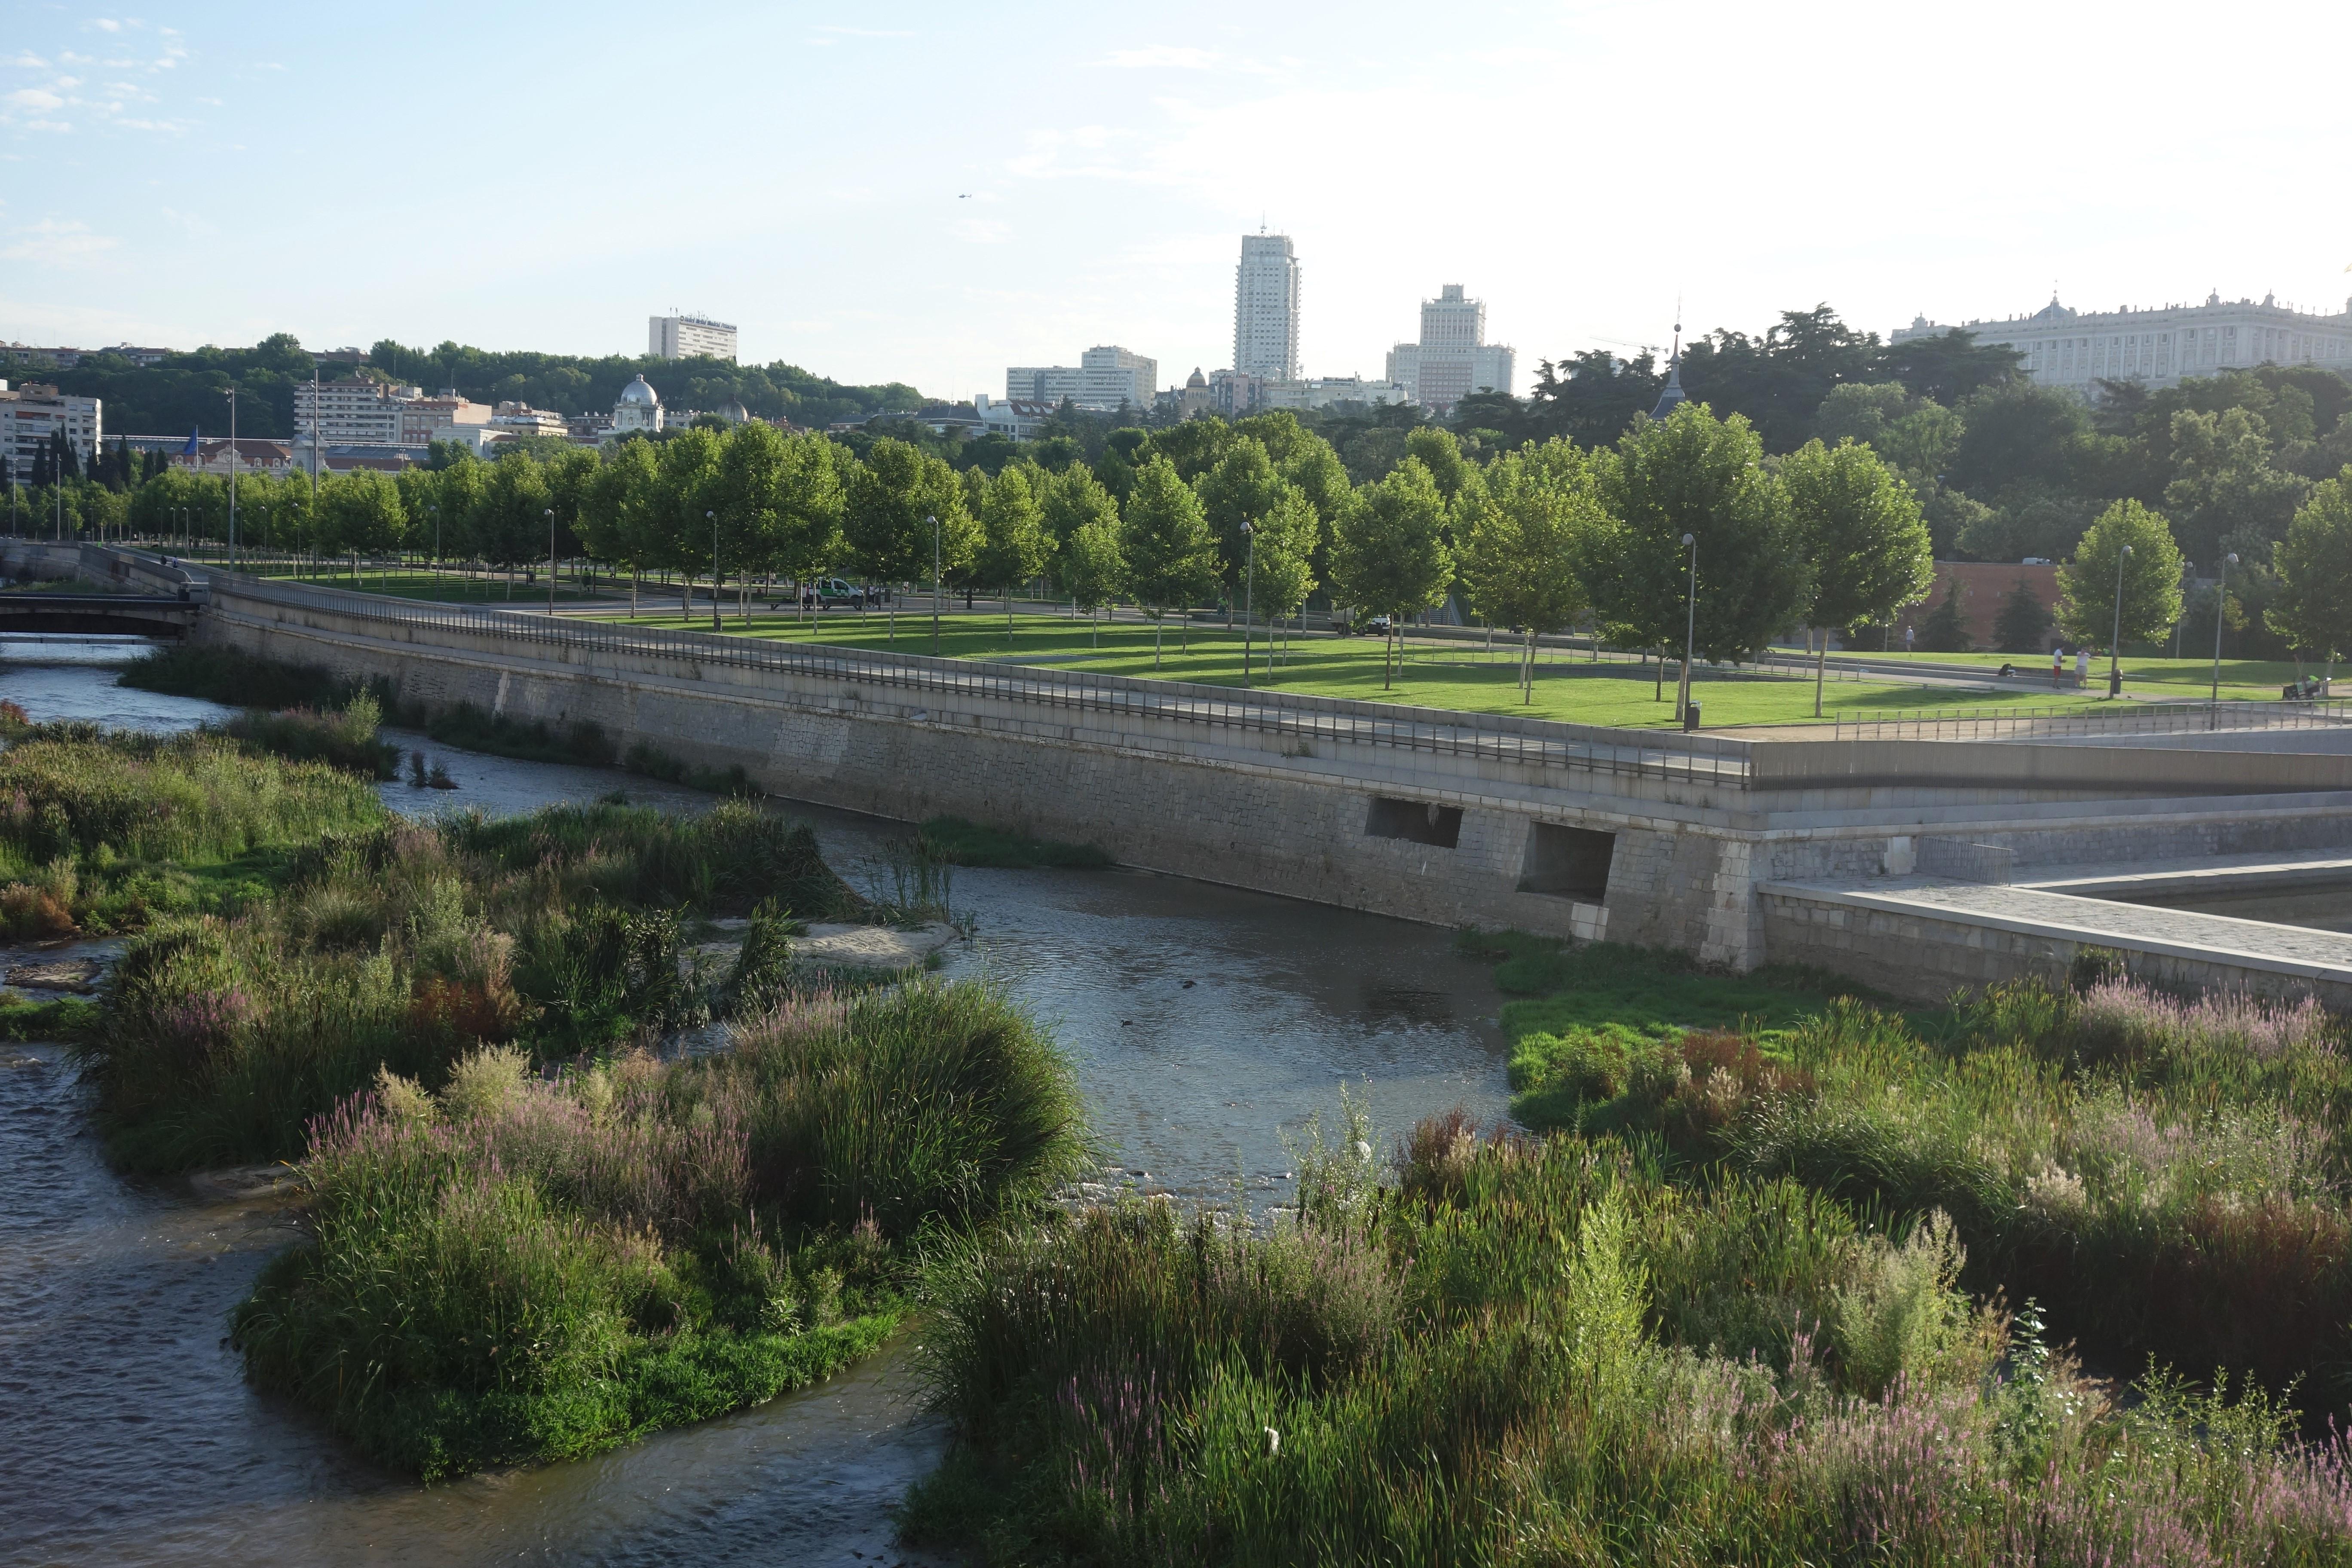 Río Manzanares, veletok protékající Madridem